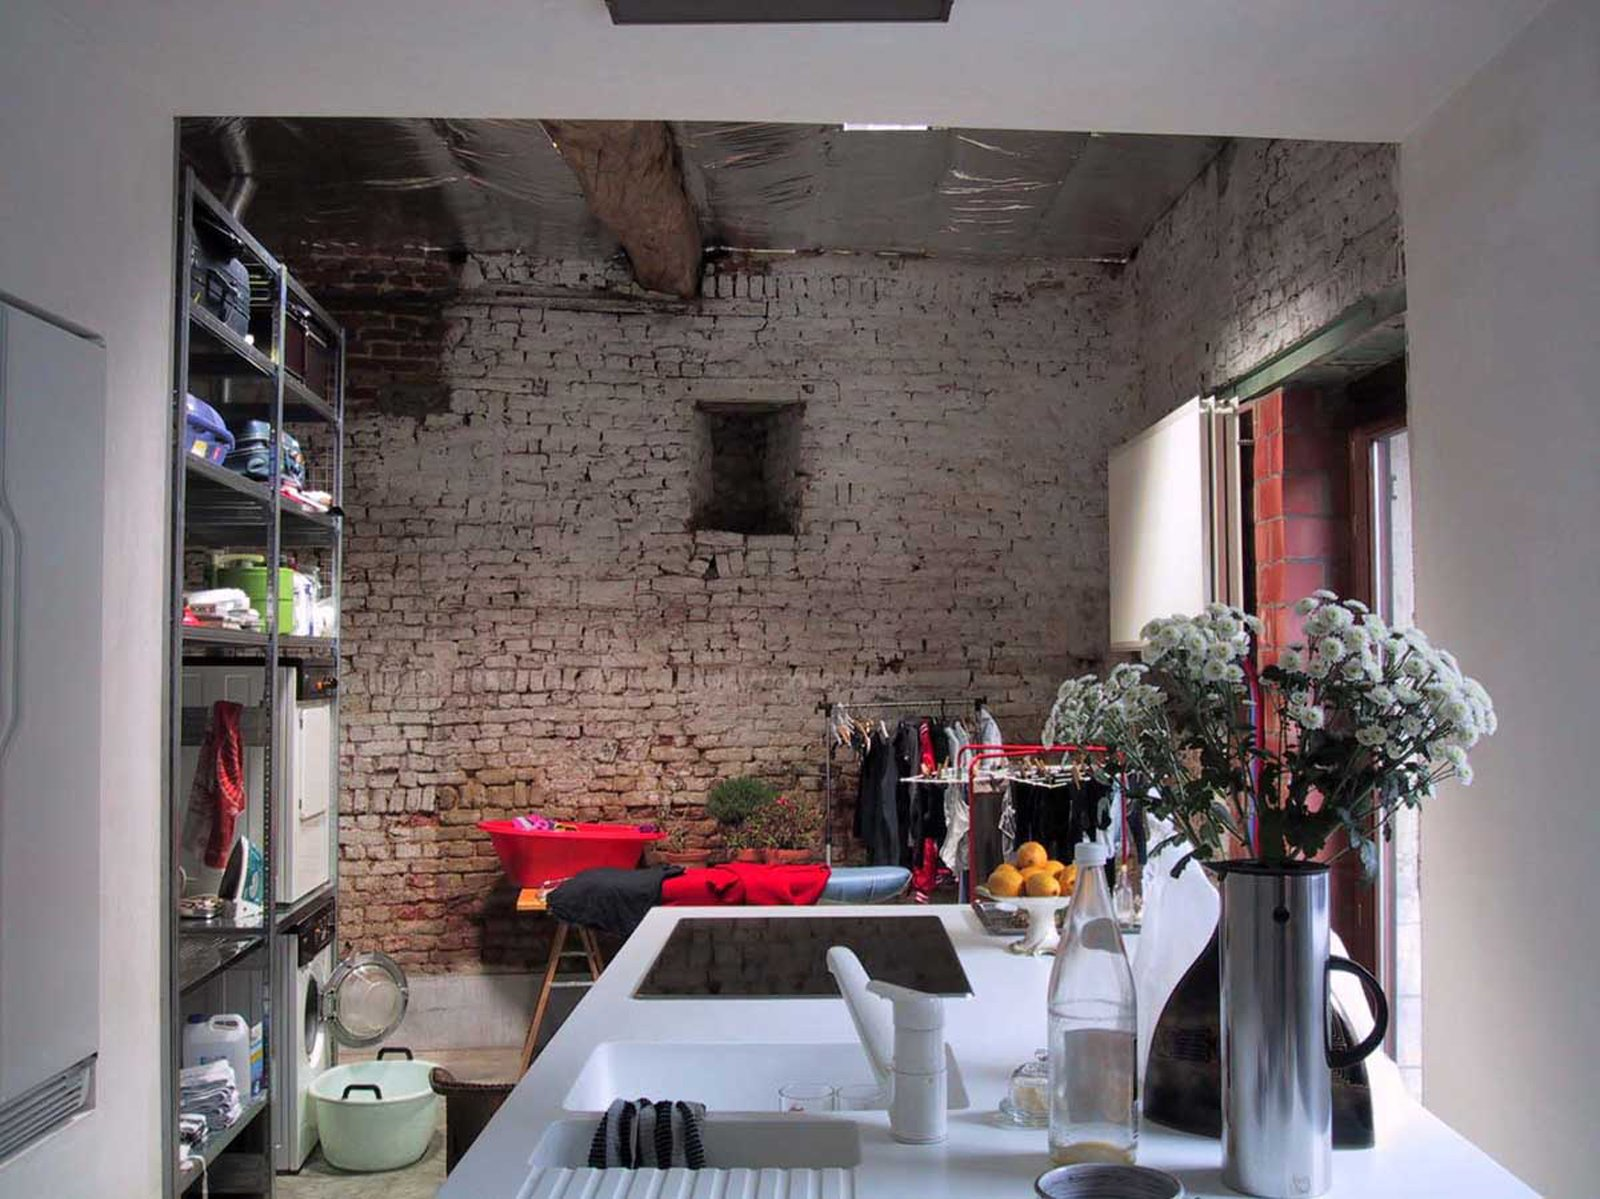 Photo 2 of 5 in Flemish Farmhouse Kitchen